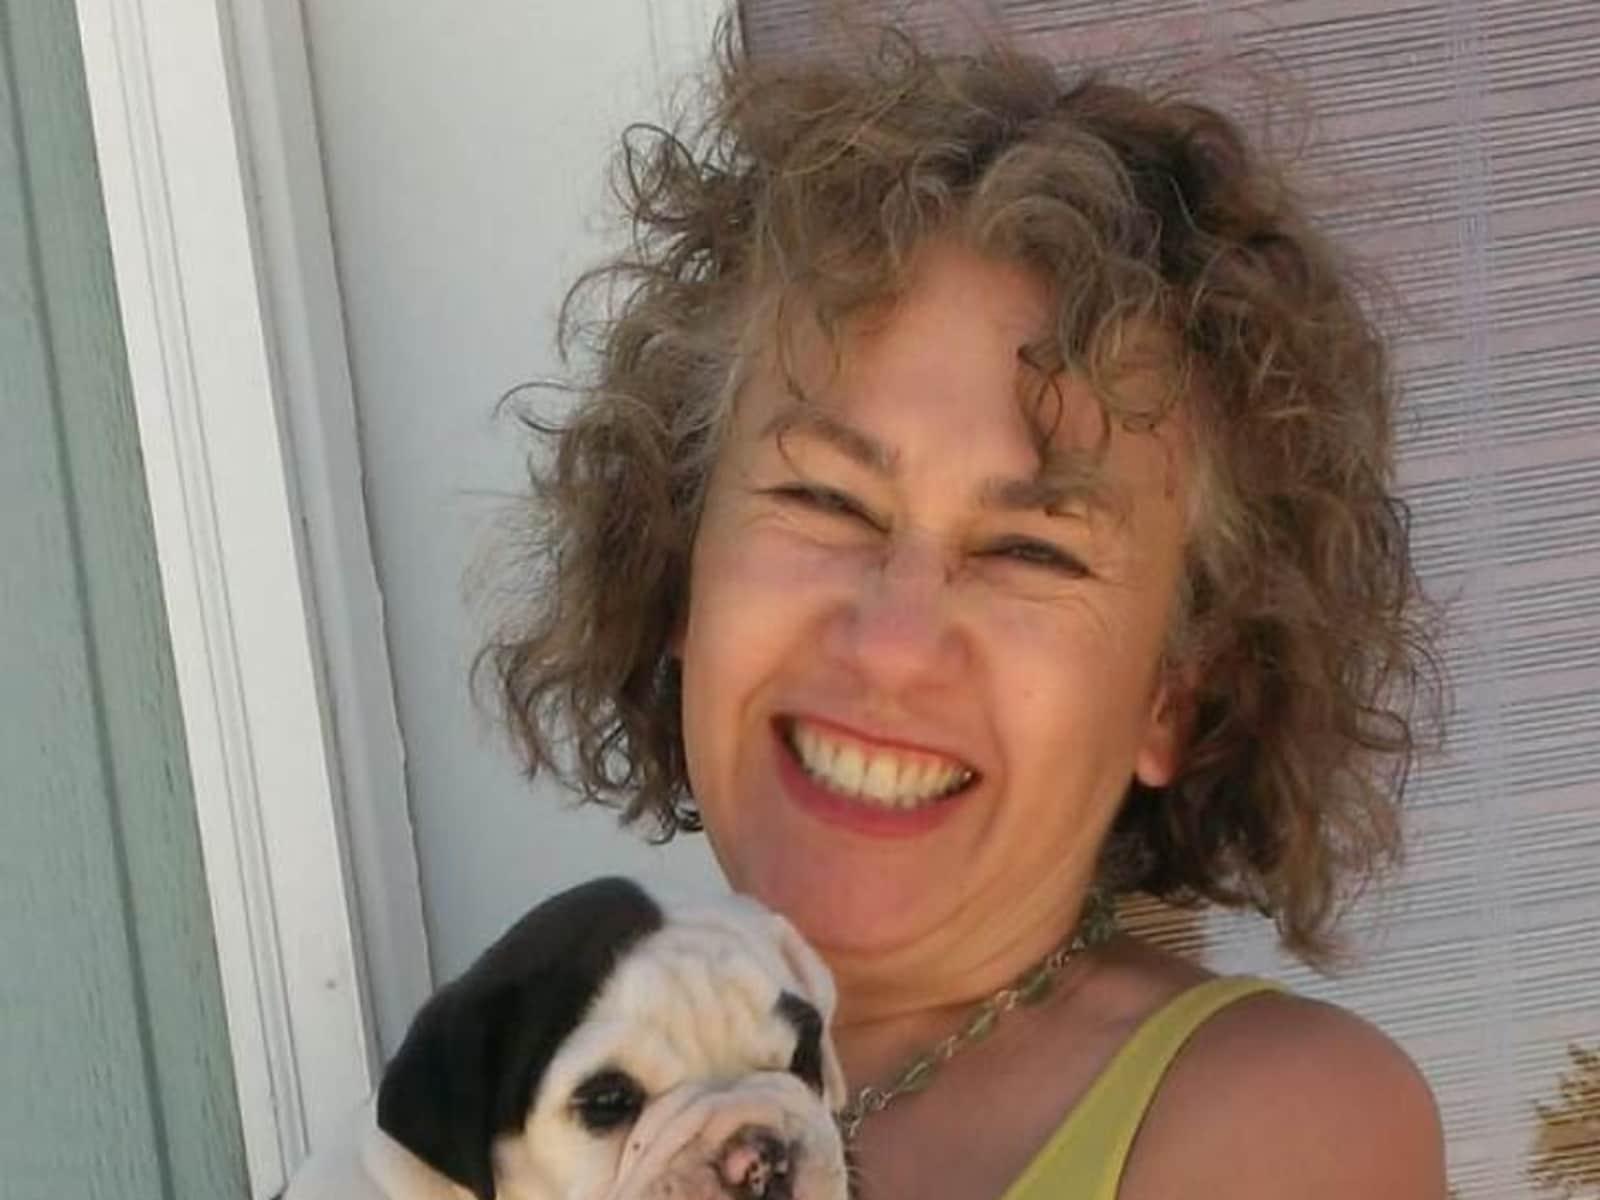 Suzy from Walla Walla, Washington, United States